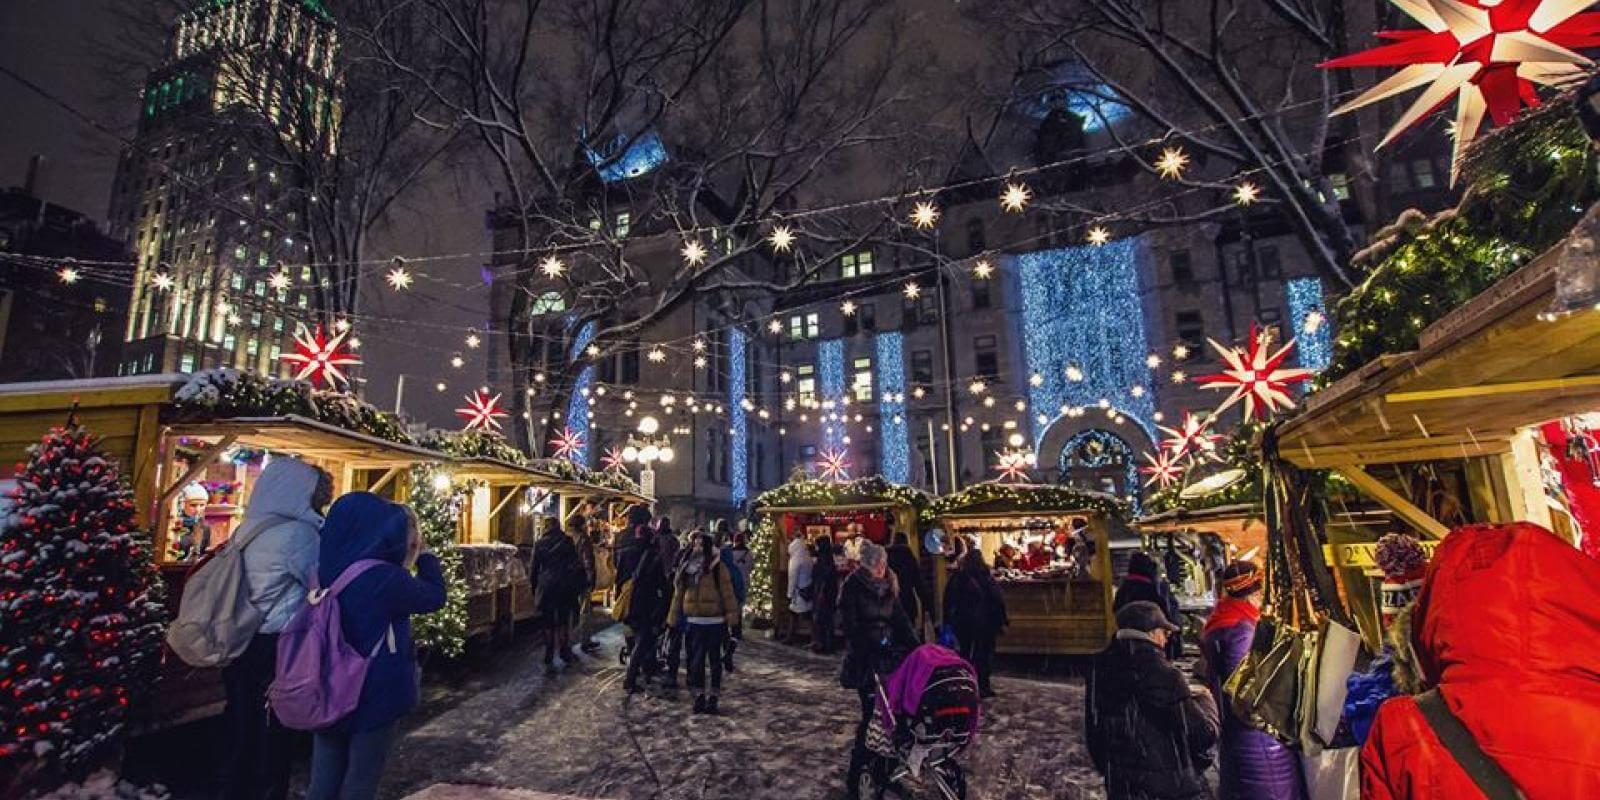 Quebec Christmas 2020 German Christmas Market| Events in Québec City